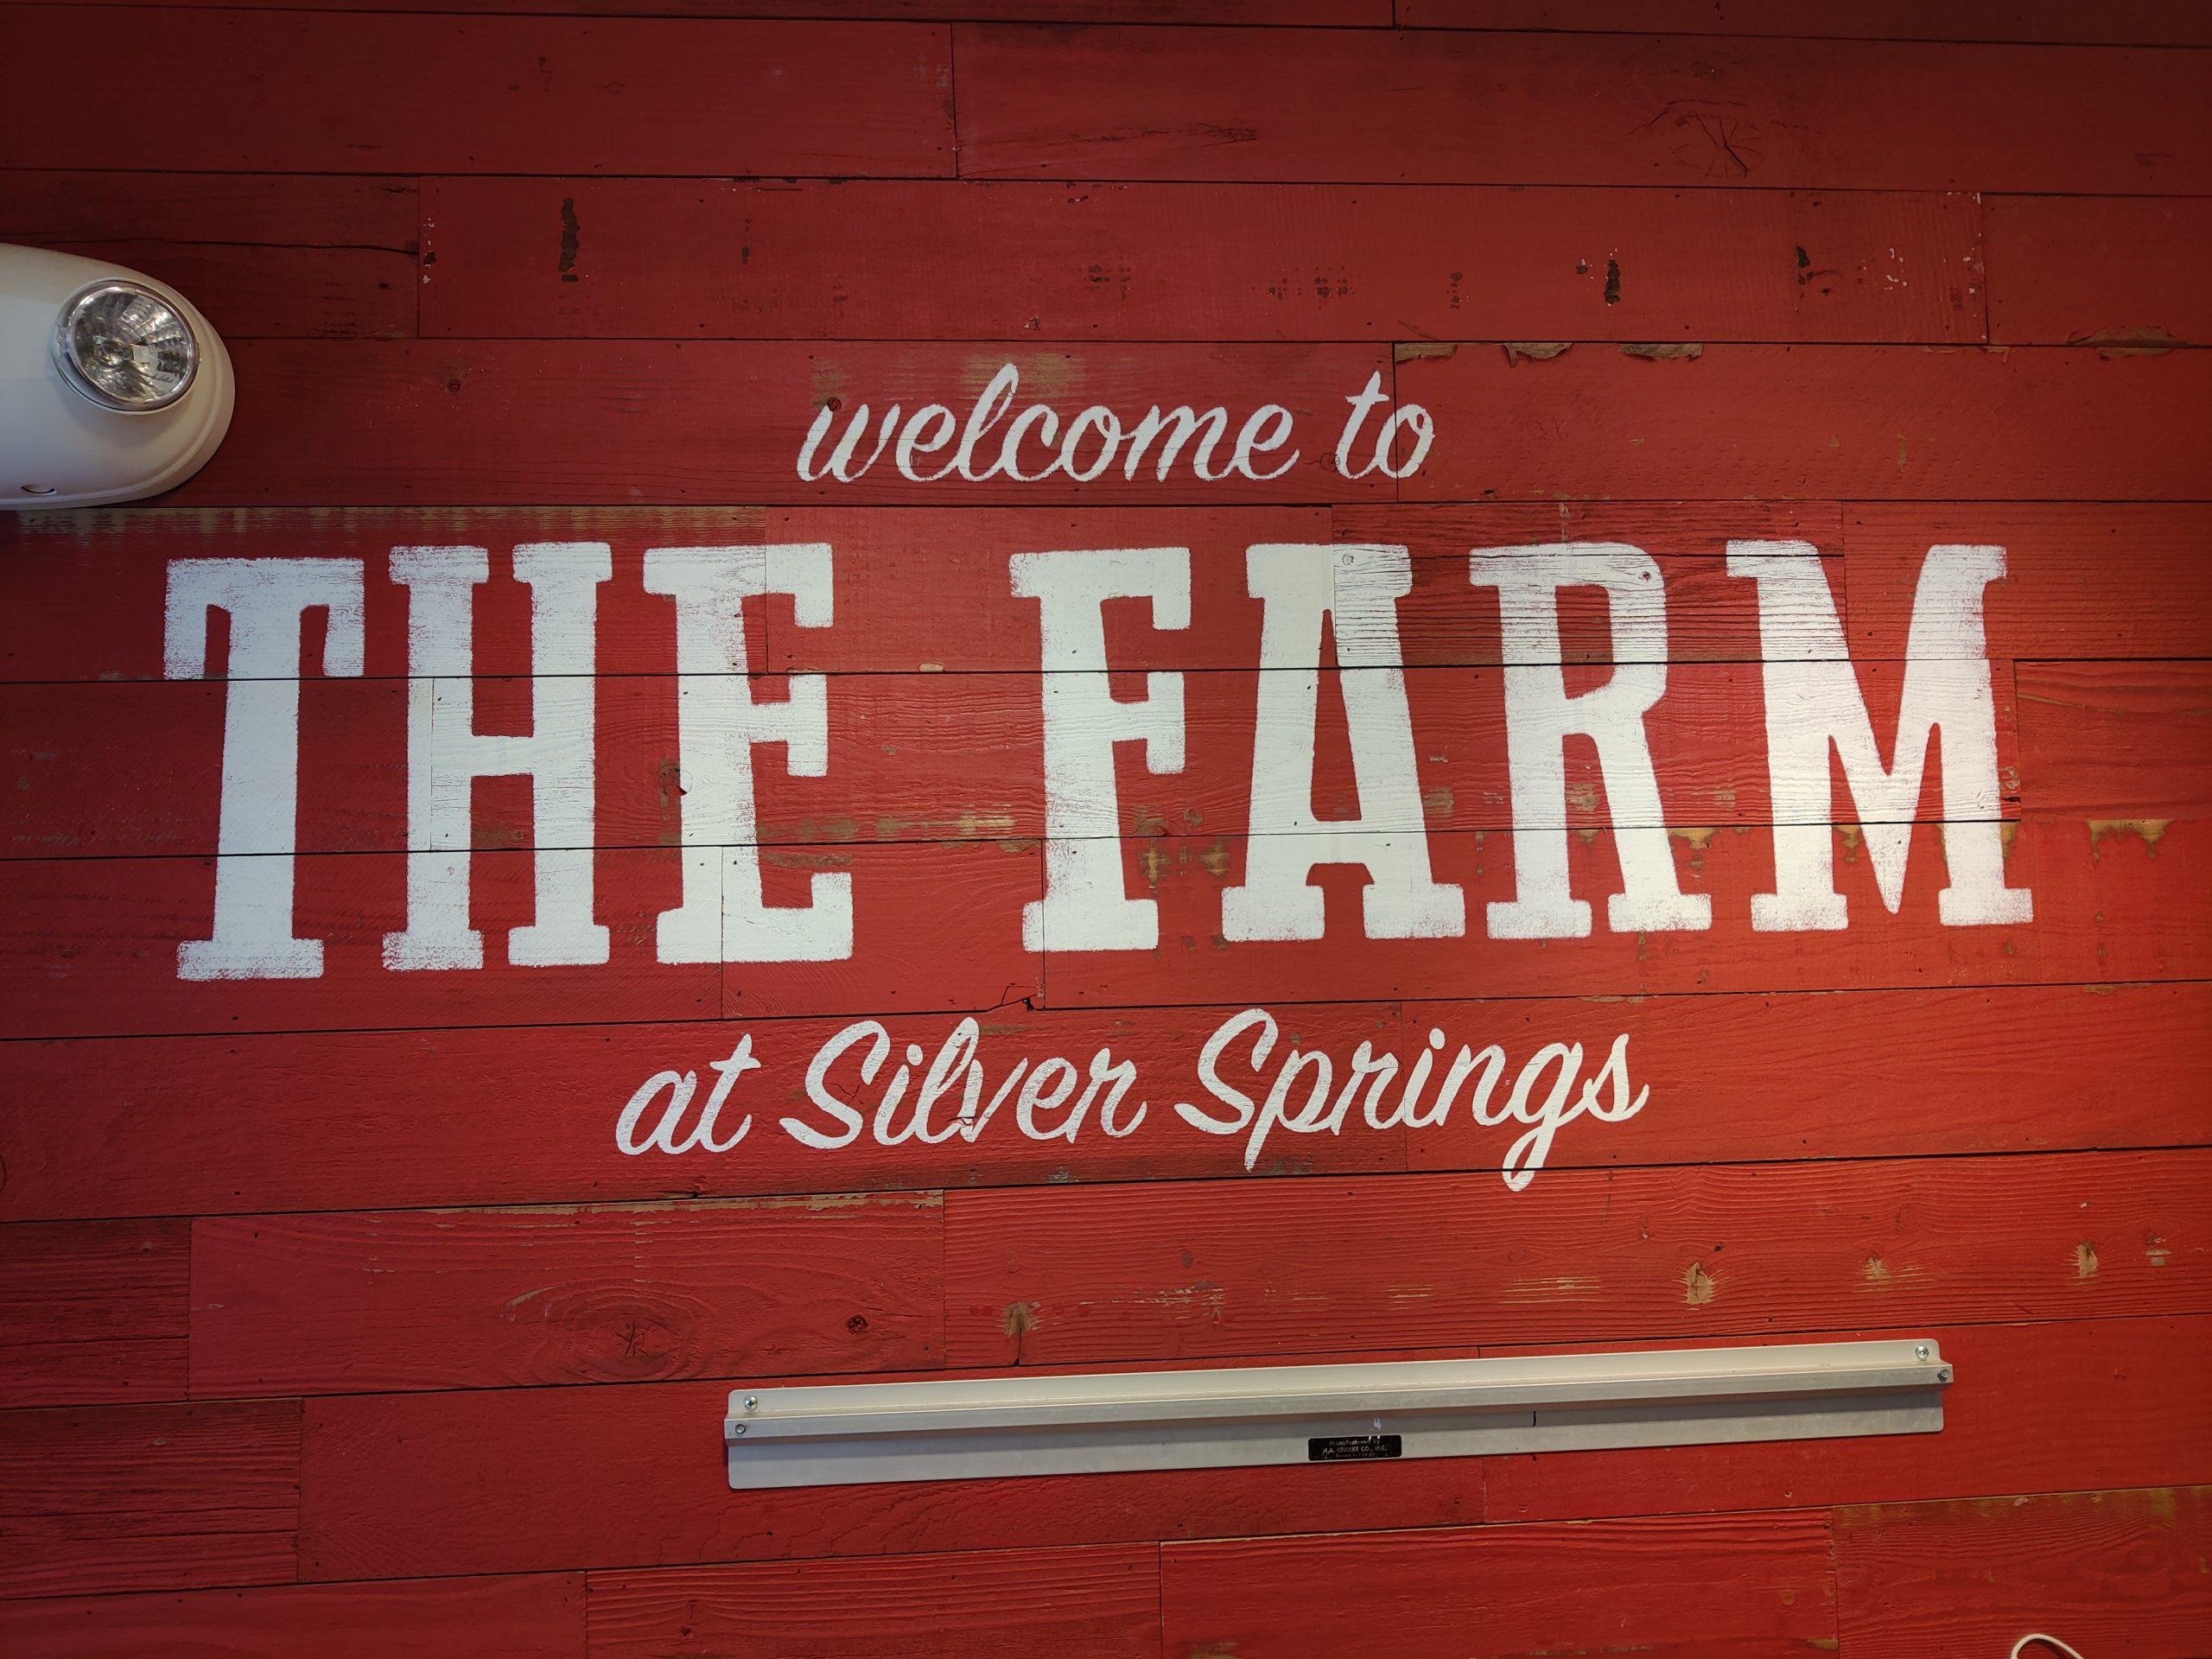 09-02-2020 Bob Evans - Silver Springs